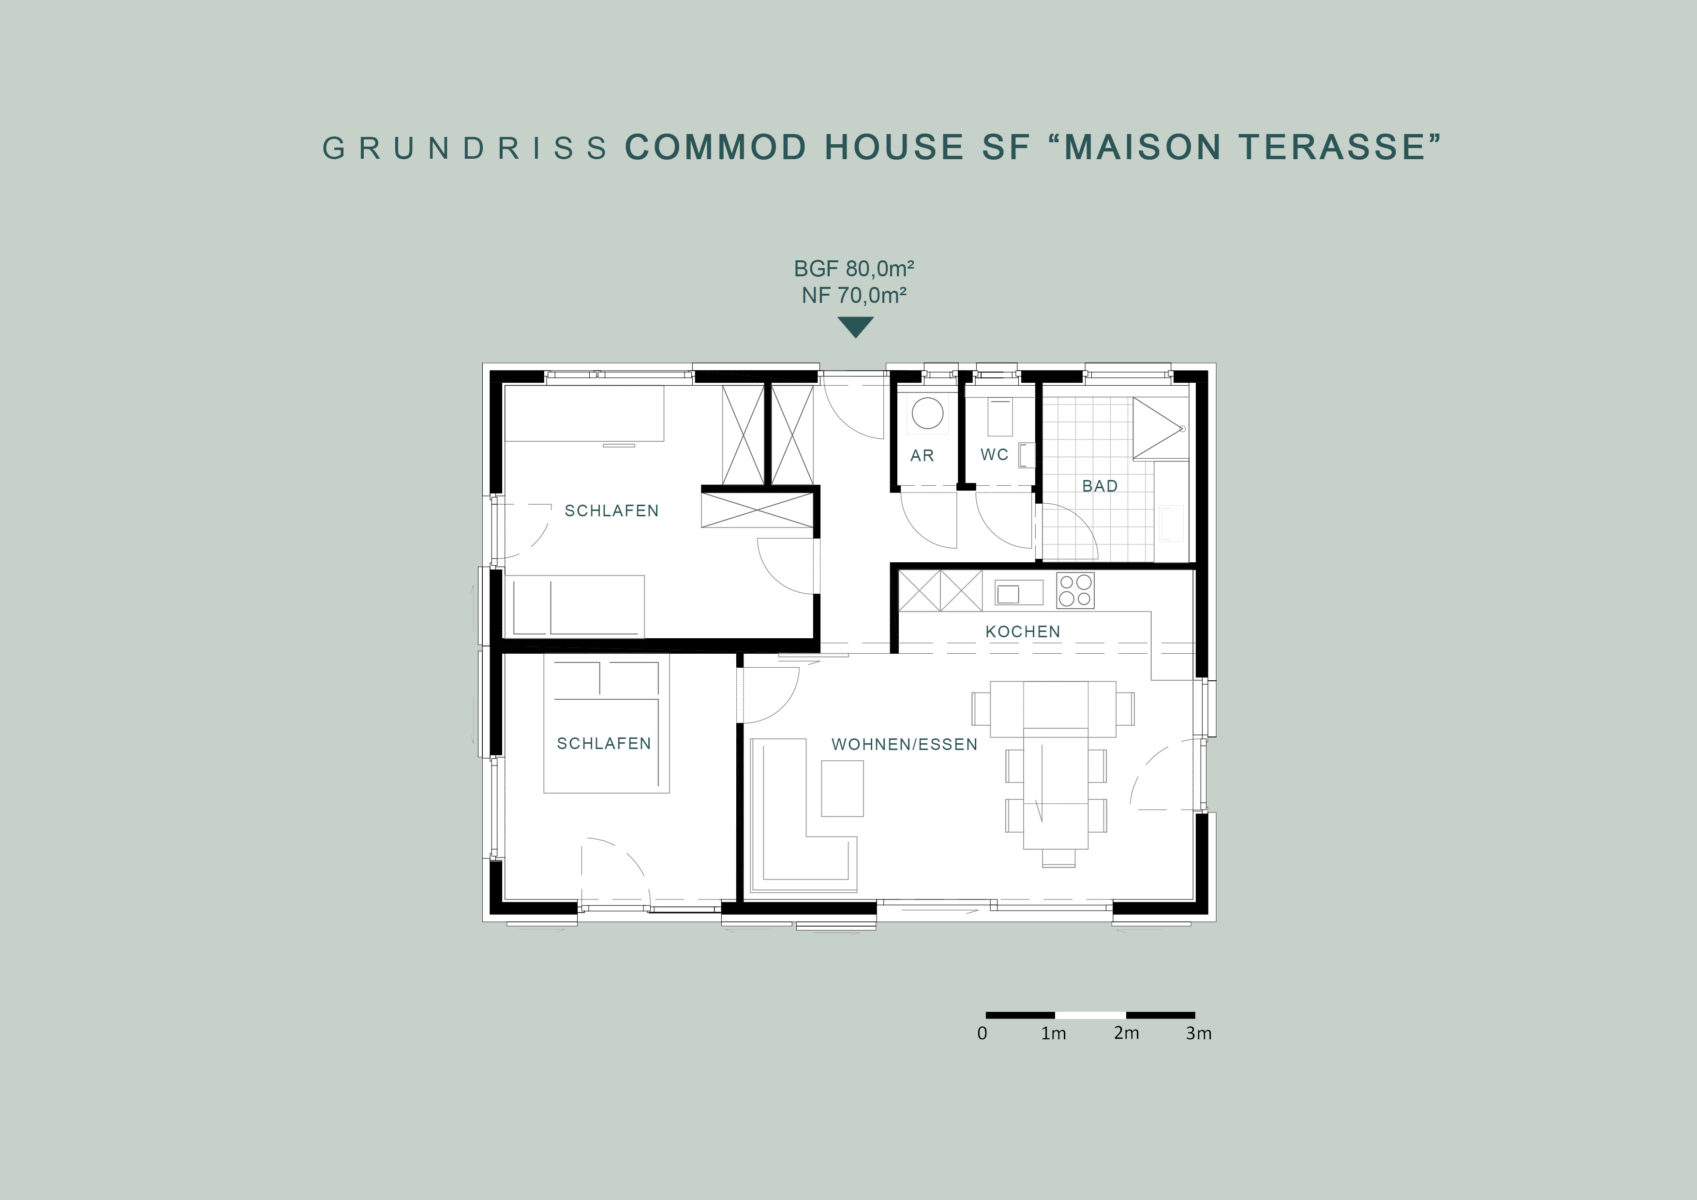 "COMMOD HOUSE SF ""Maison Terrasse"" 80m² BGF"